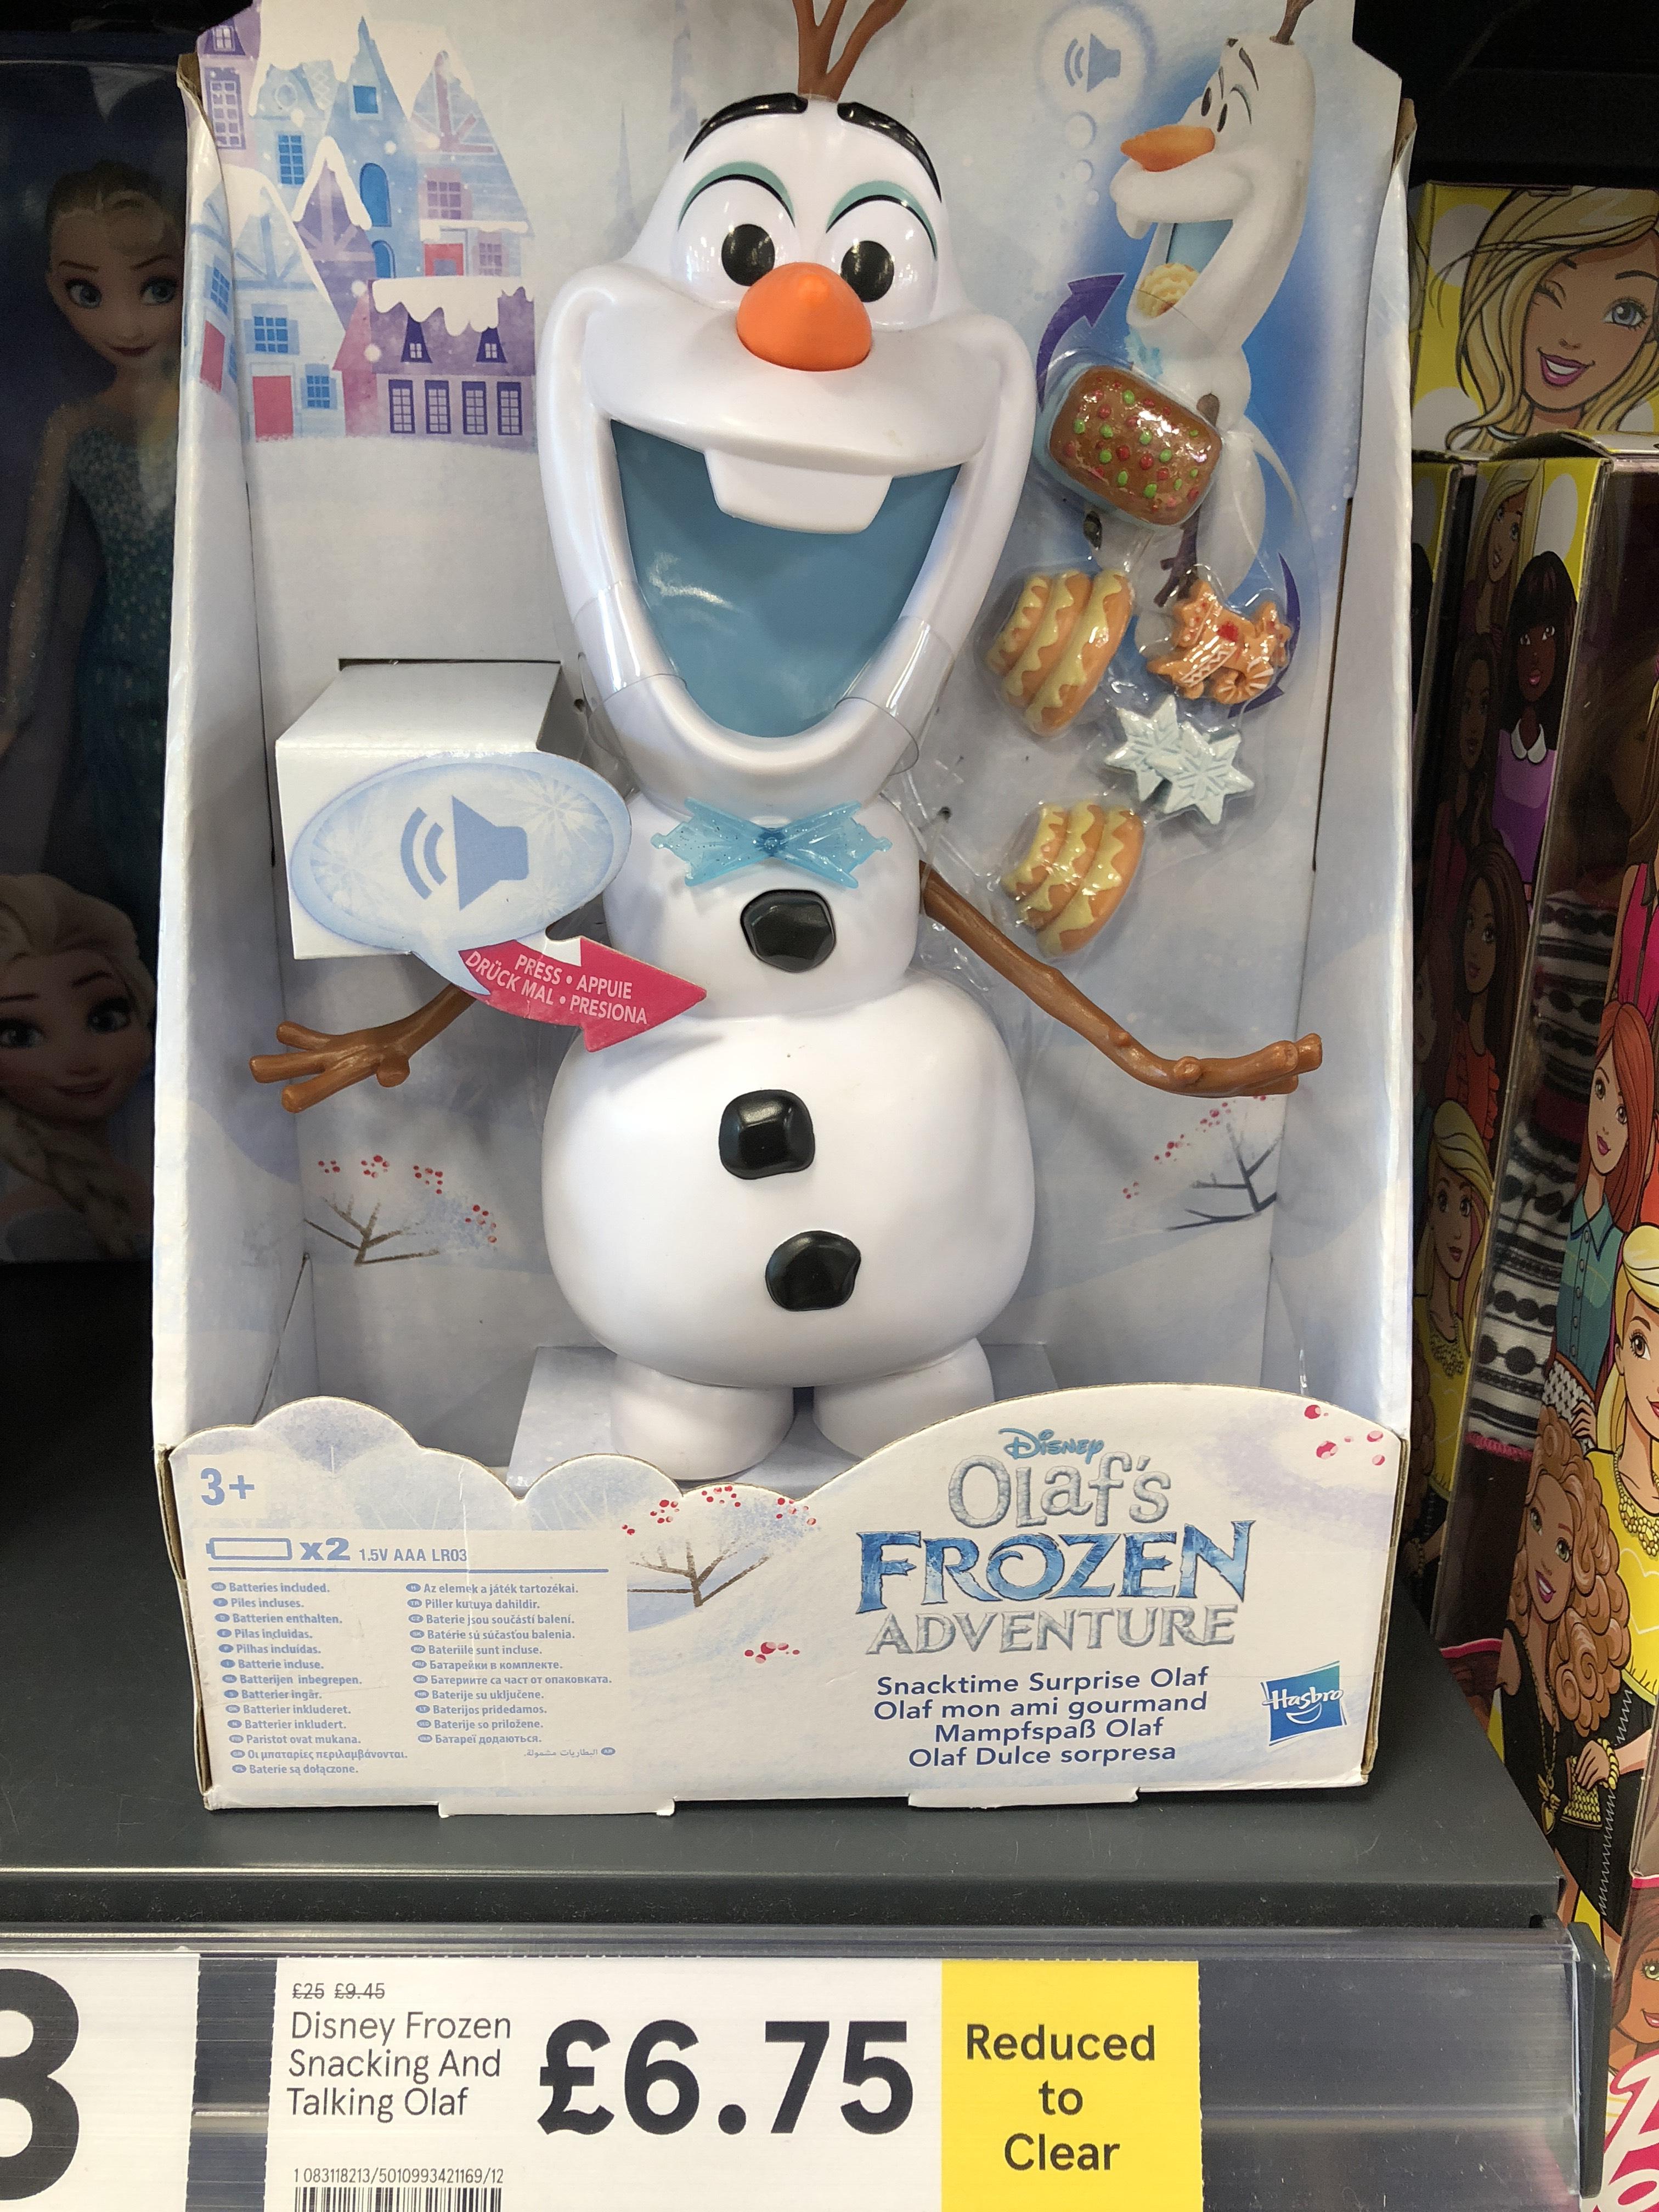 Disney Frozen adventure Snacking And Talking Olaf £6.75 @ Tesco corstorphine edinburgh